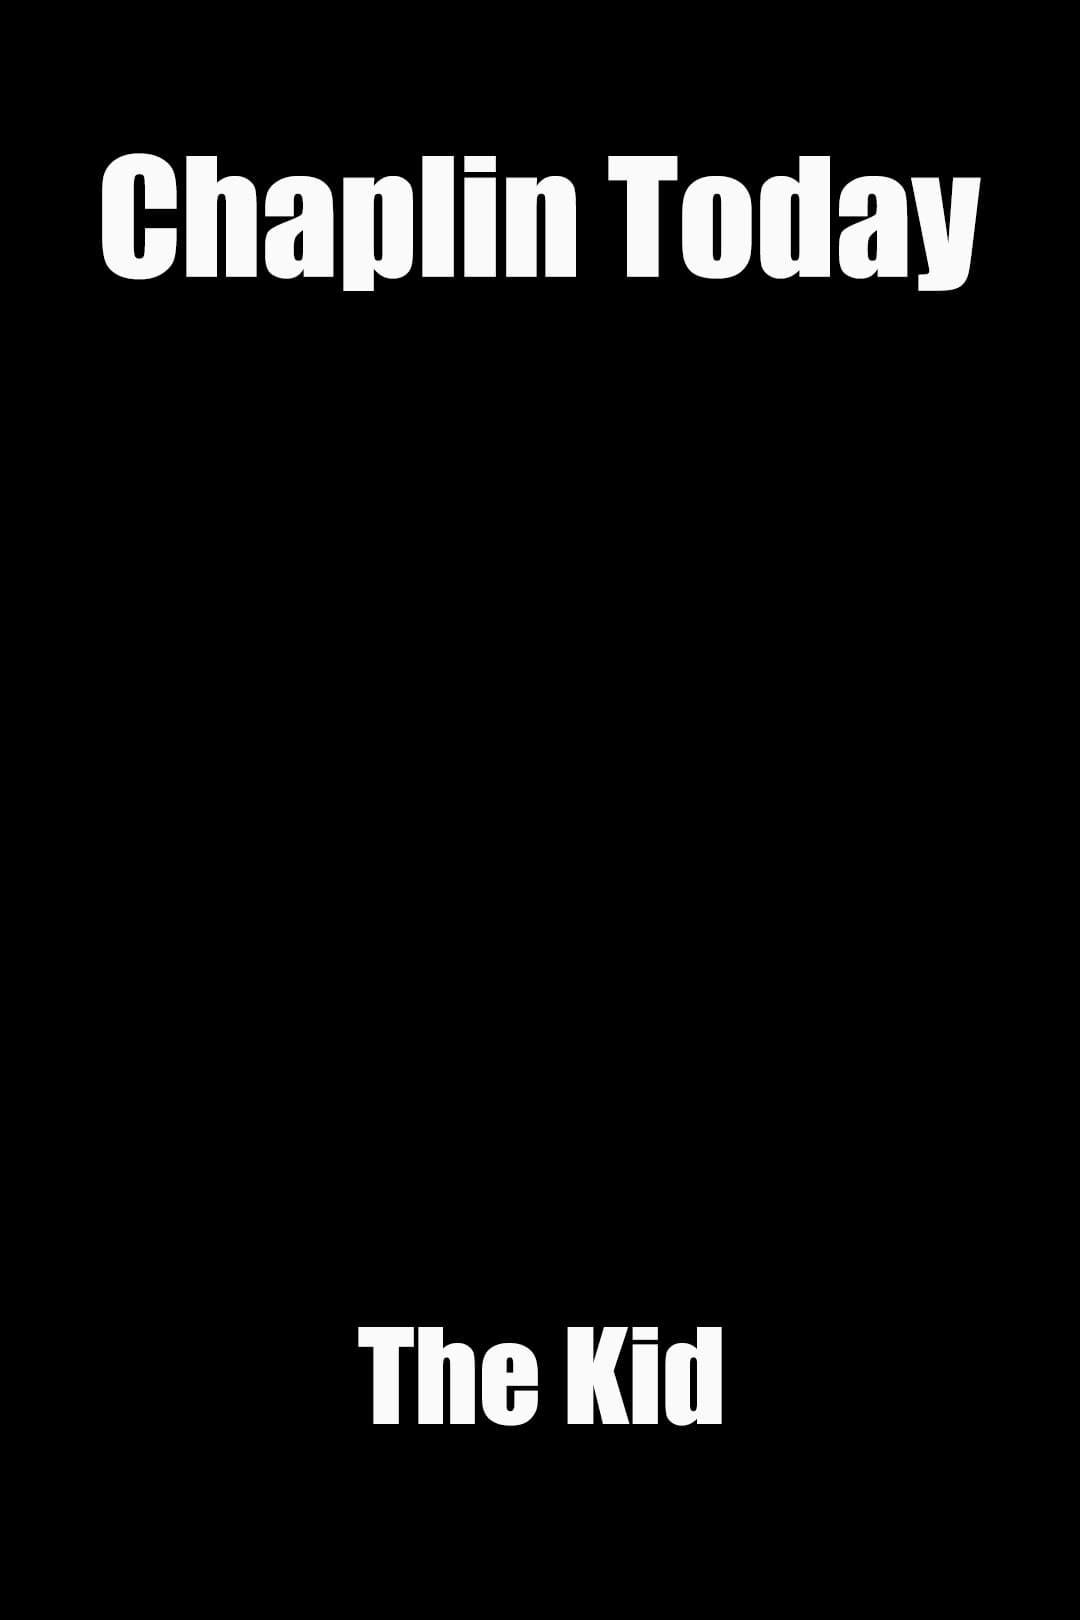 Chaplin Today: The Kid